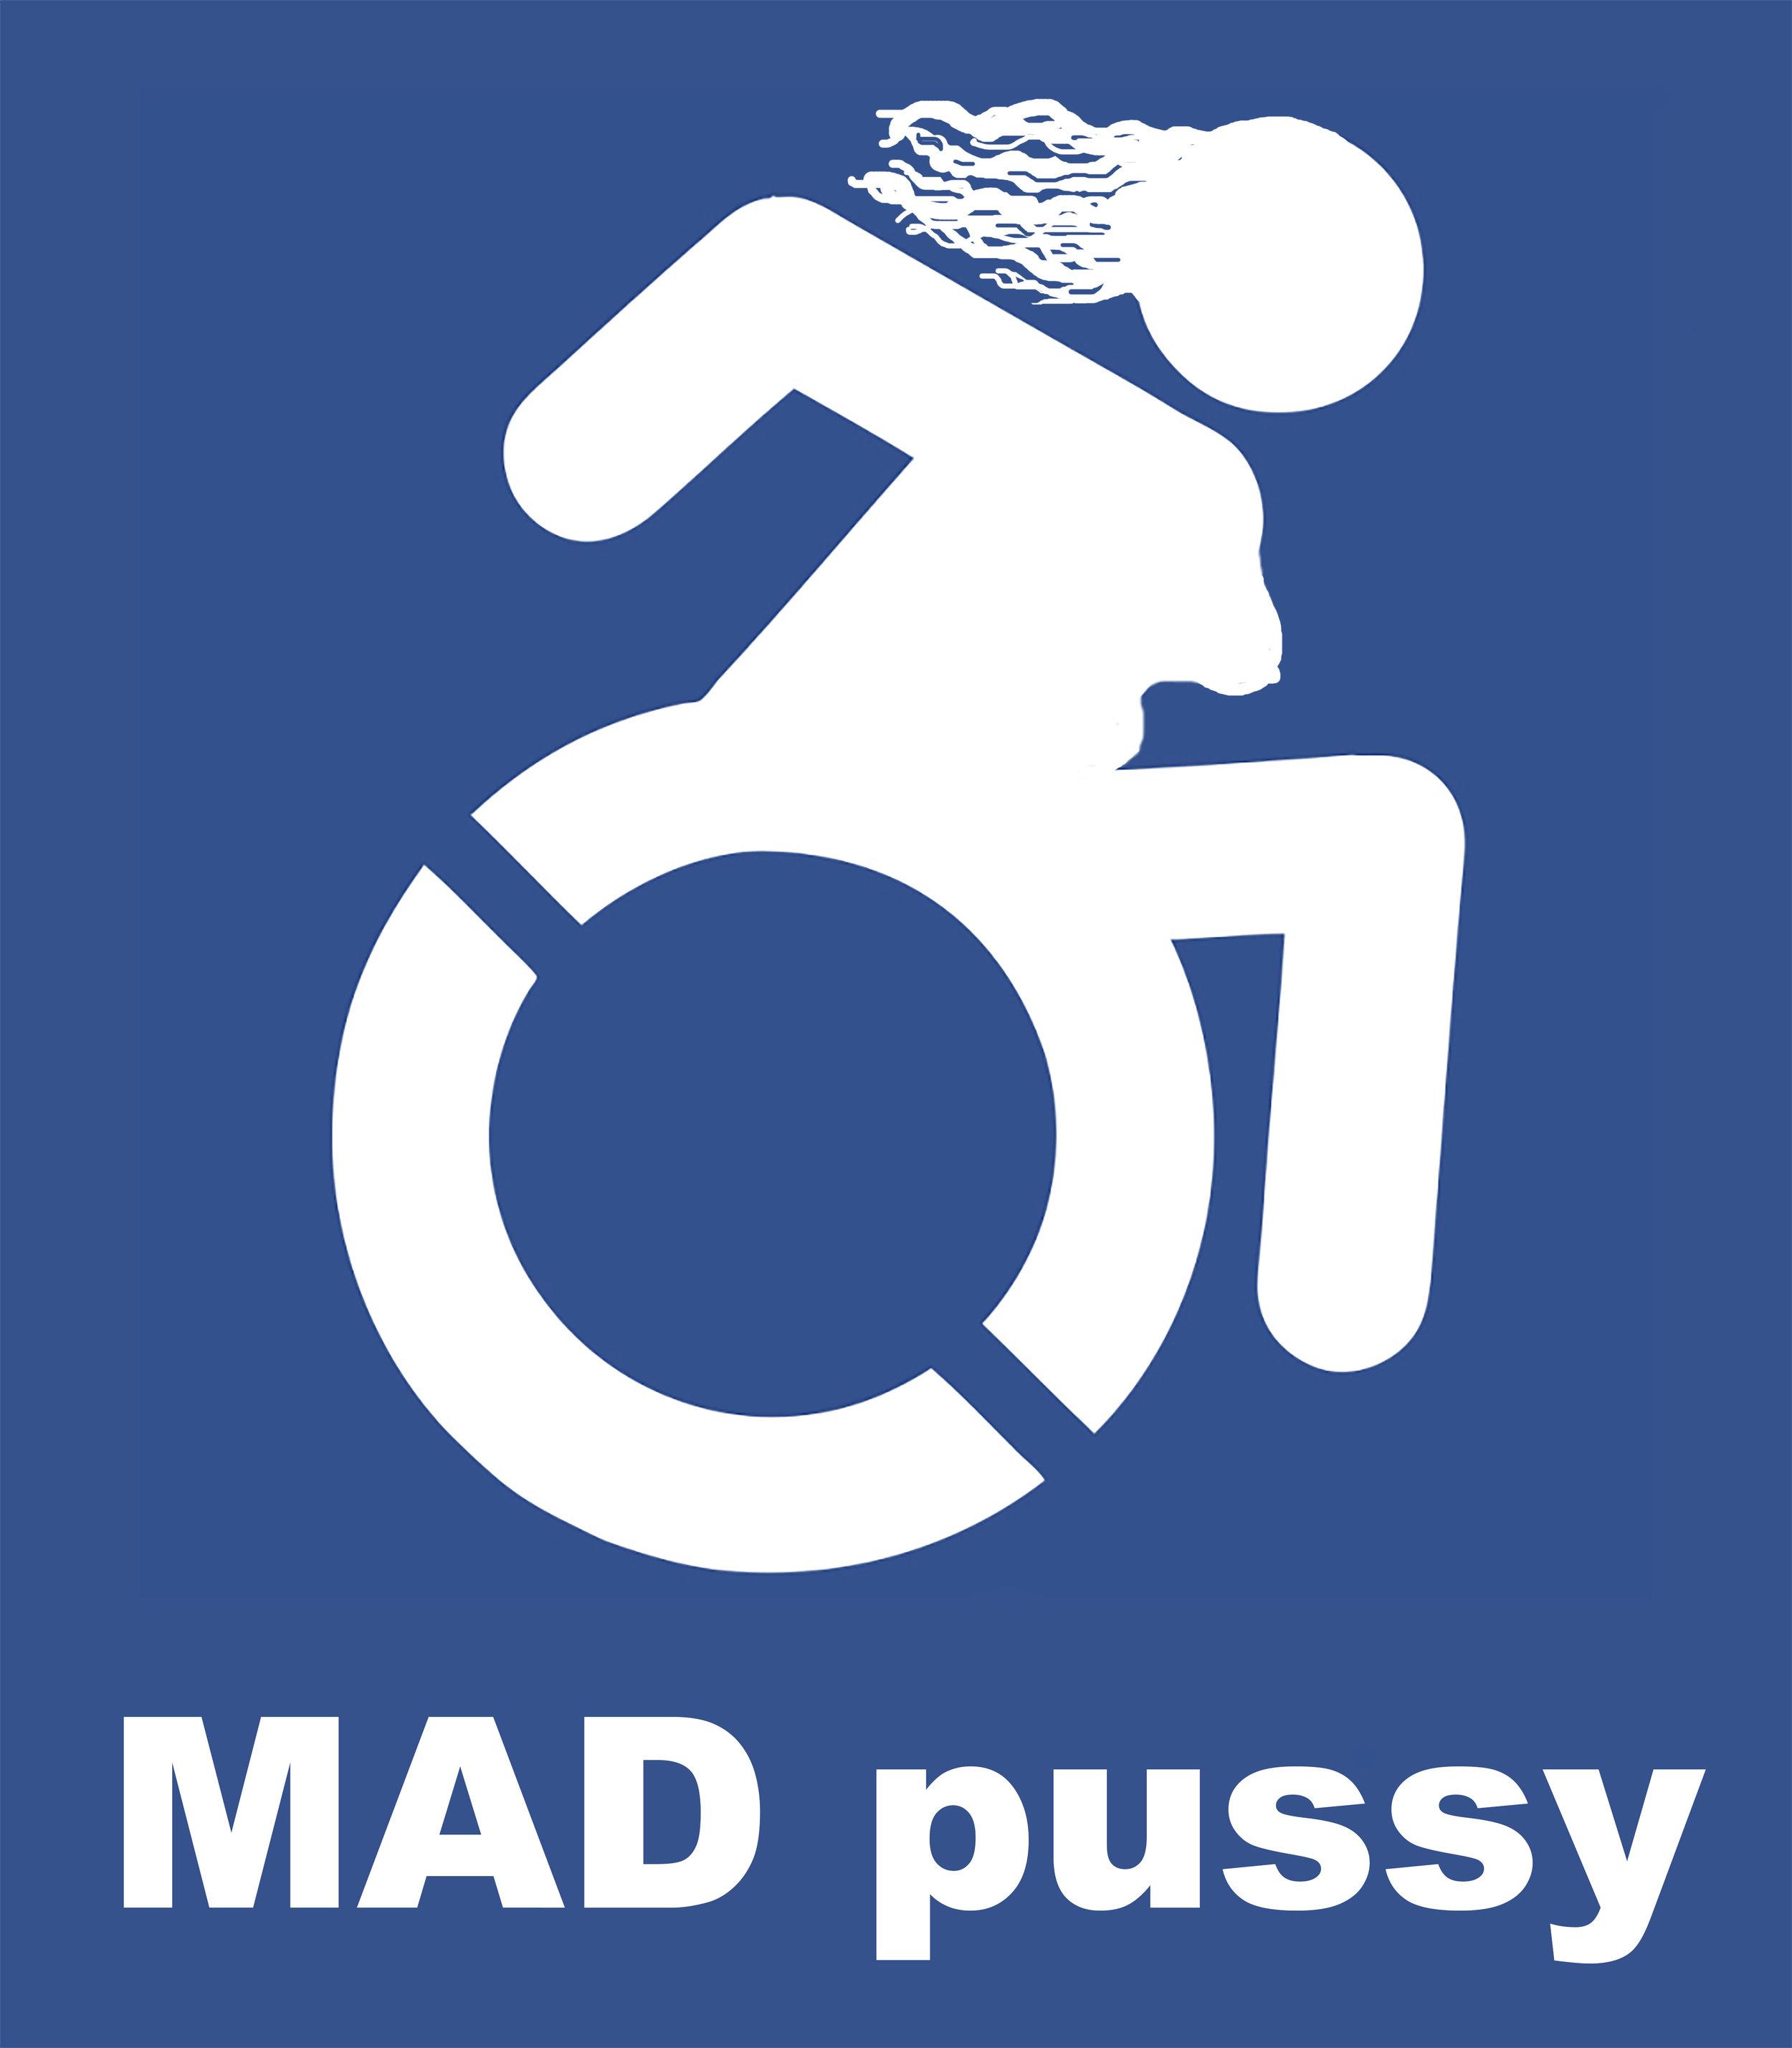 MAD pussy_2.jpg